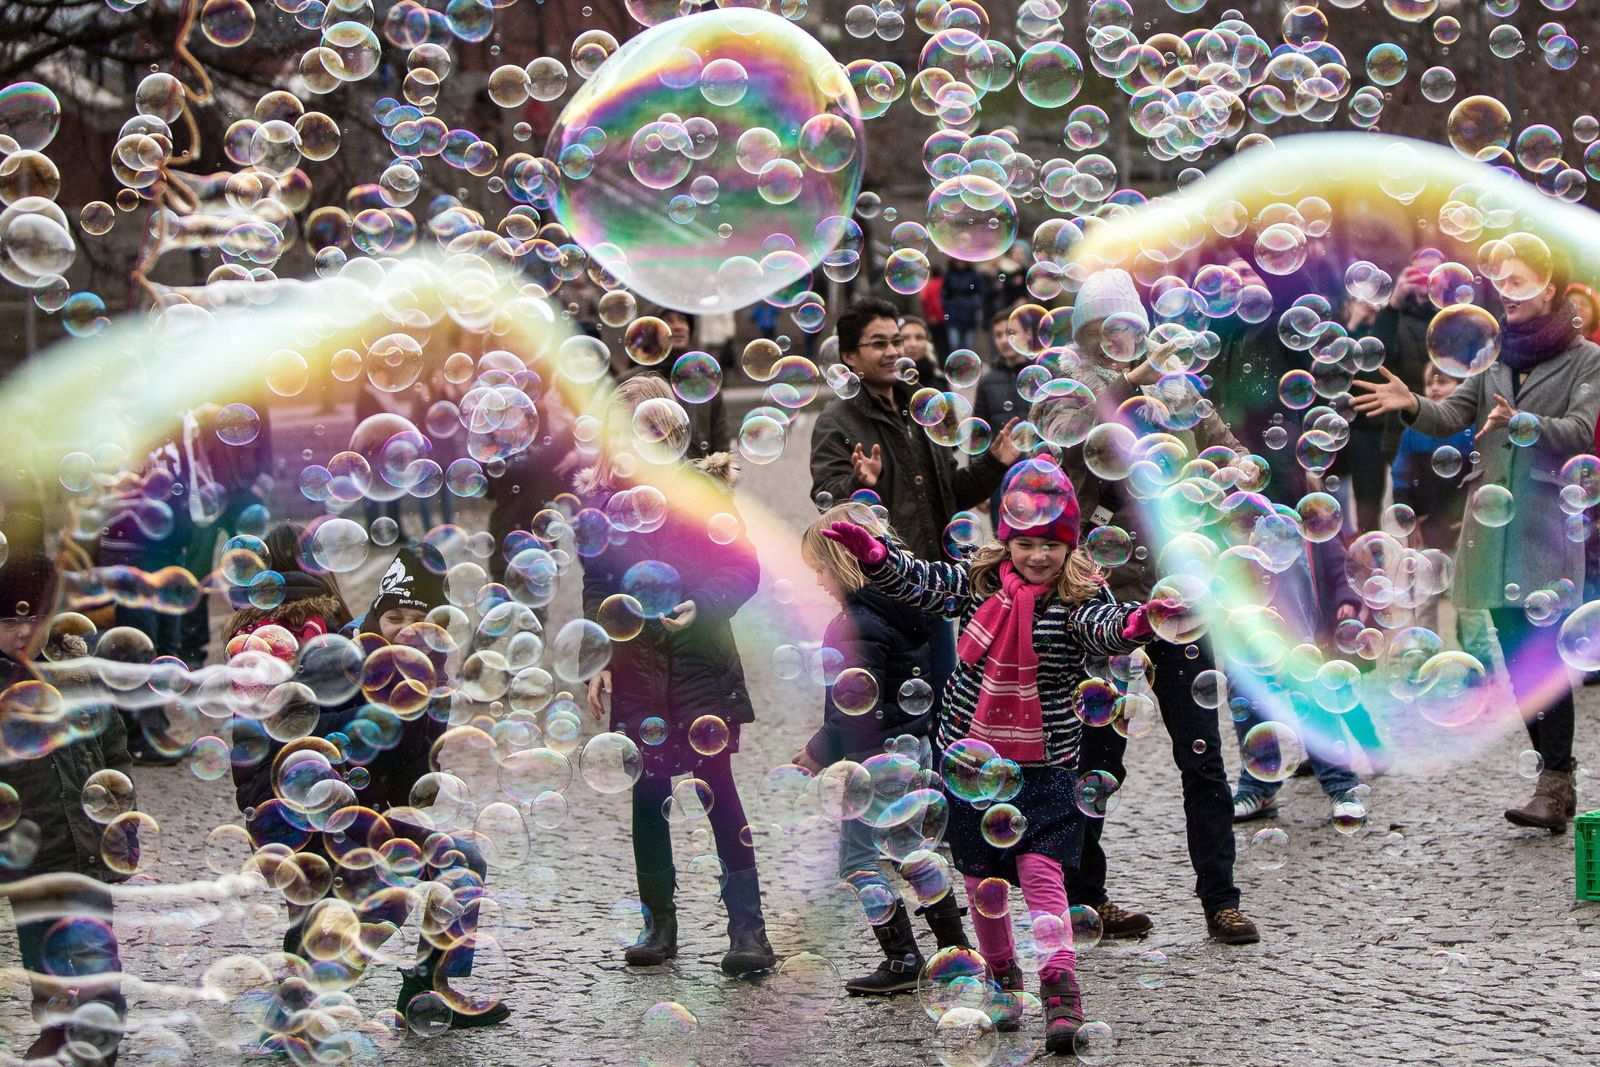 Seifenblasen in Köln